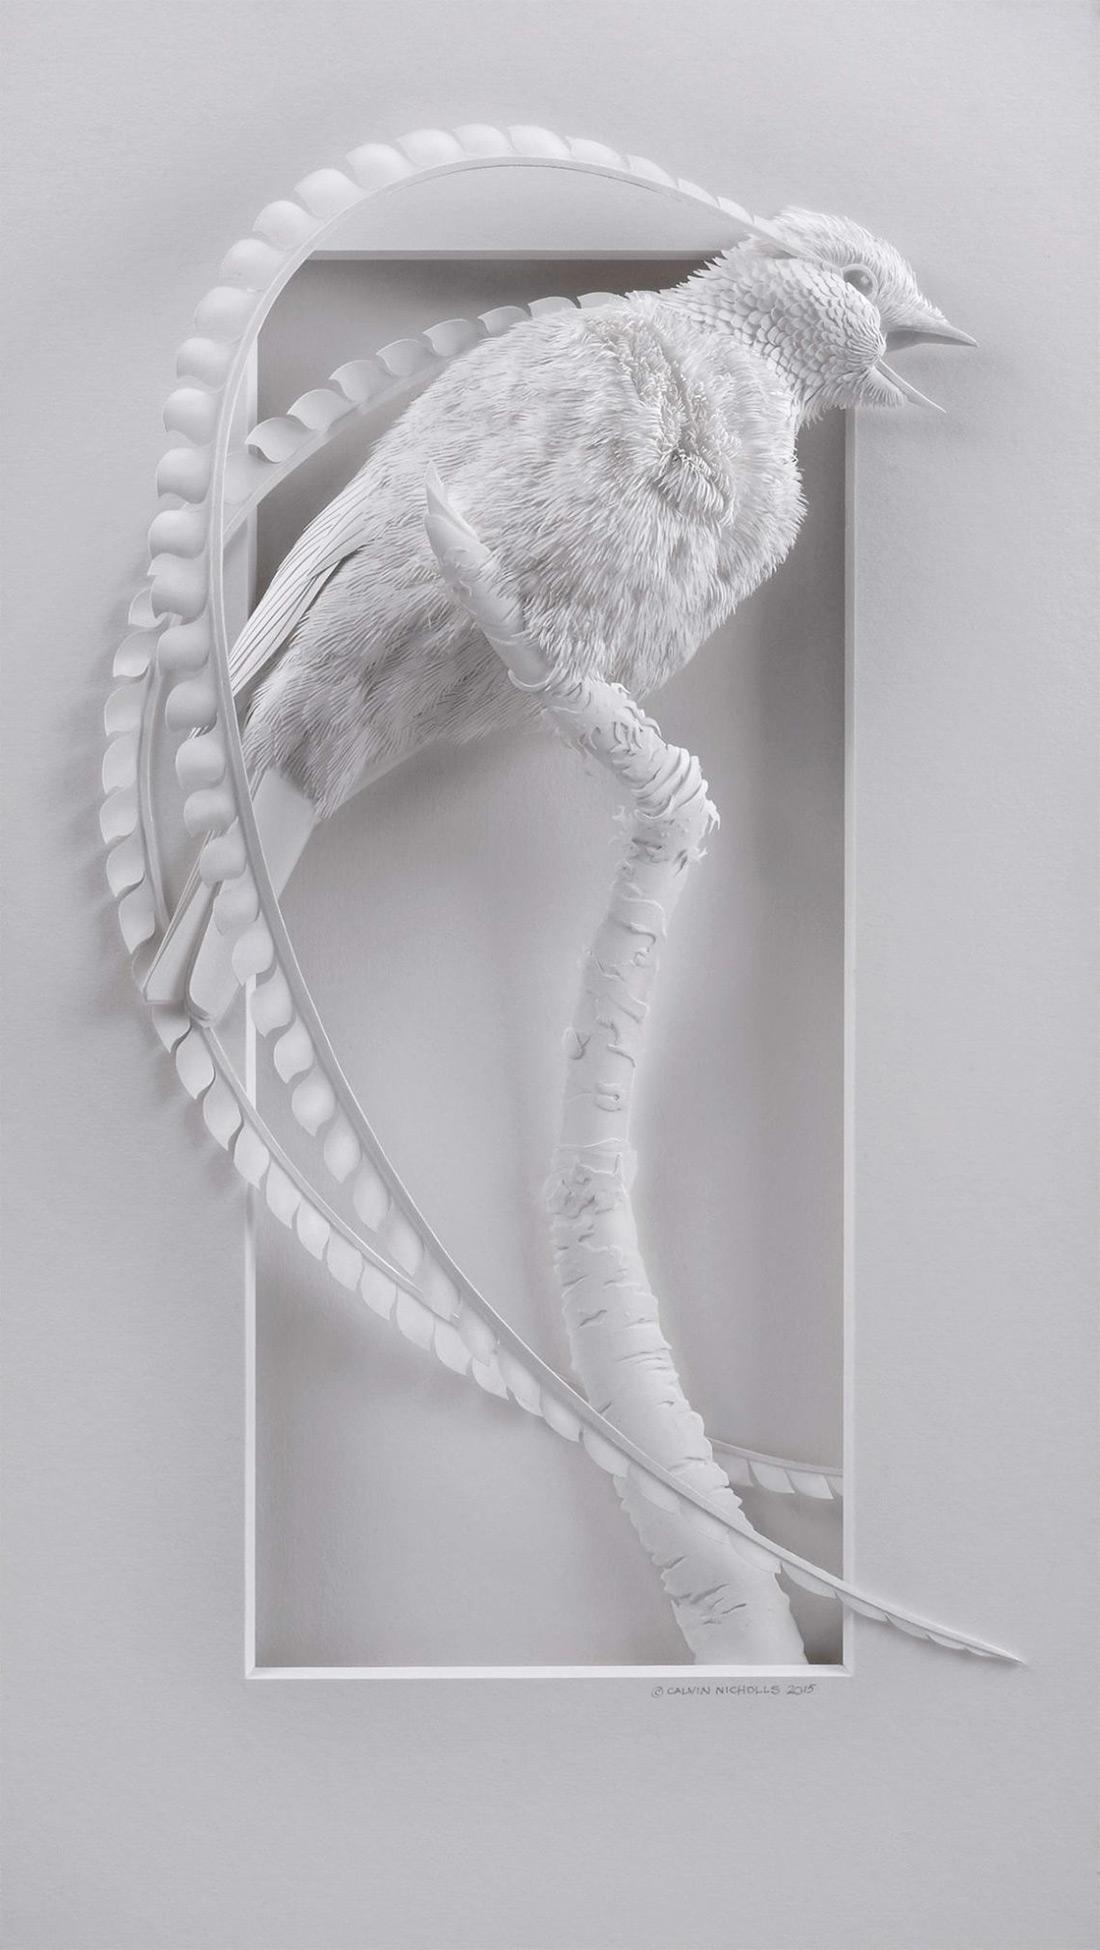 Calvin Nicholls Paper Art 1